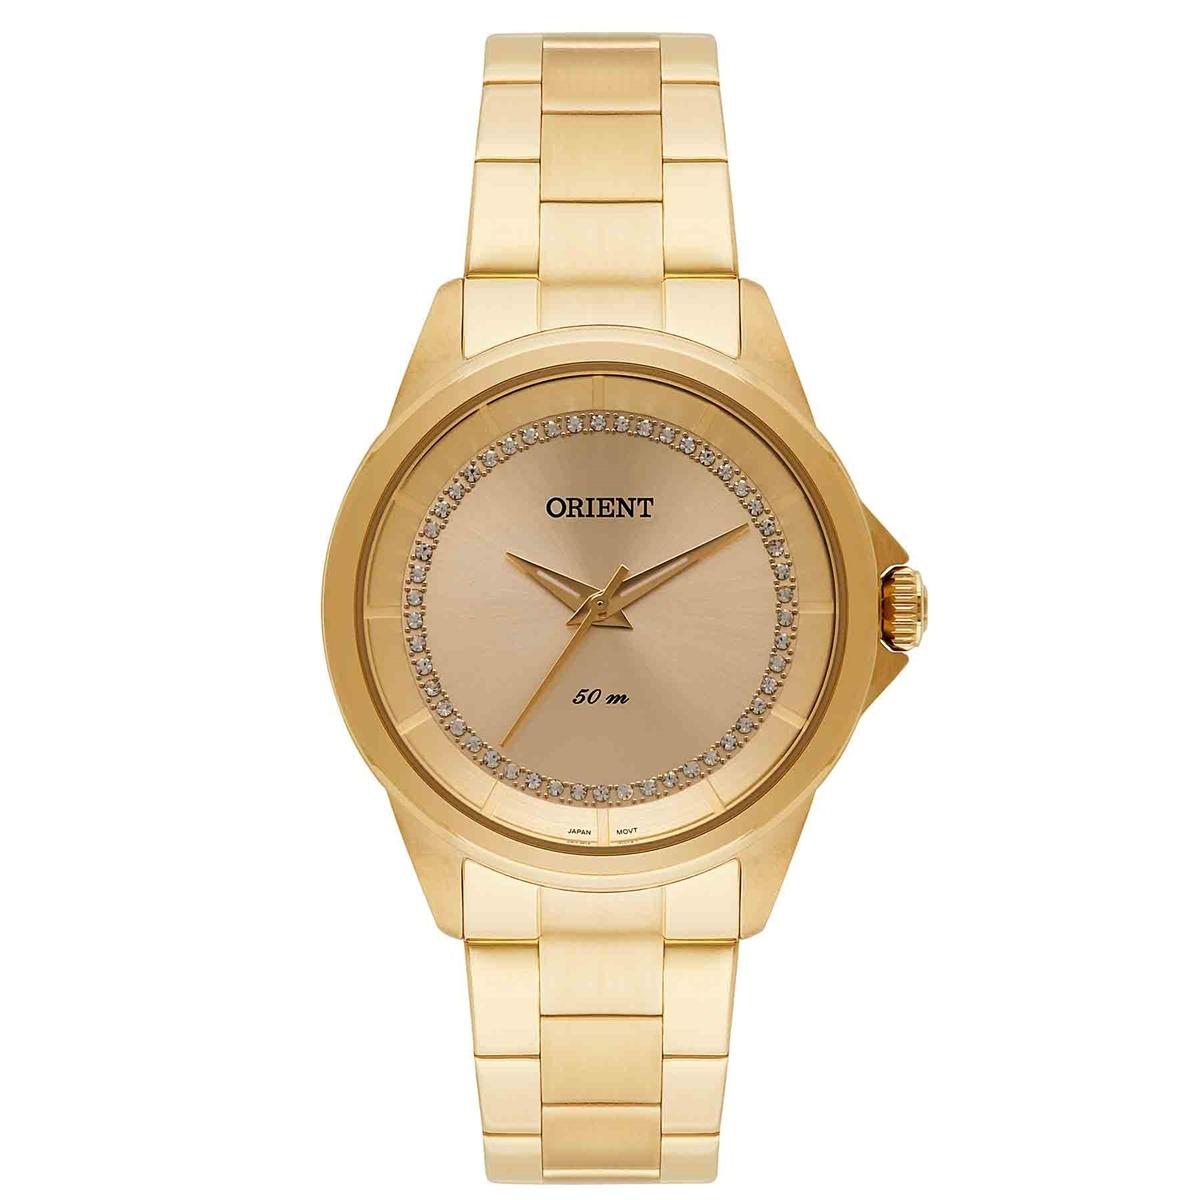 28fdf60a8ff relógio orient analógico feminino swarovski fgss0076 c1kx. Carregando zoom.